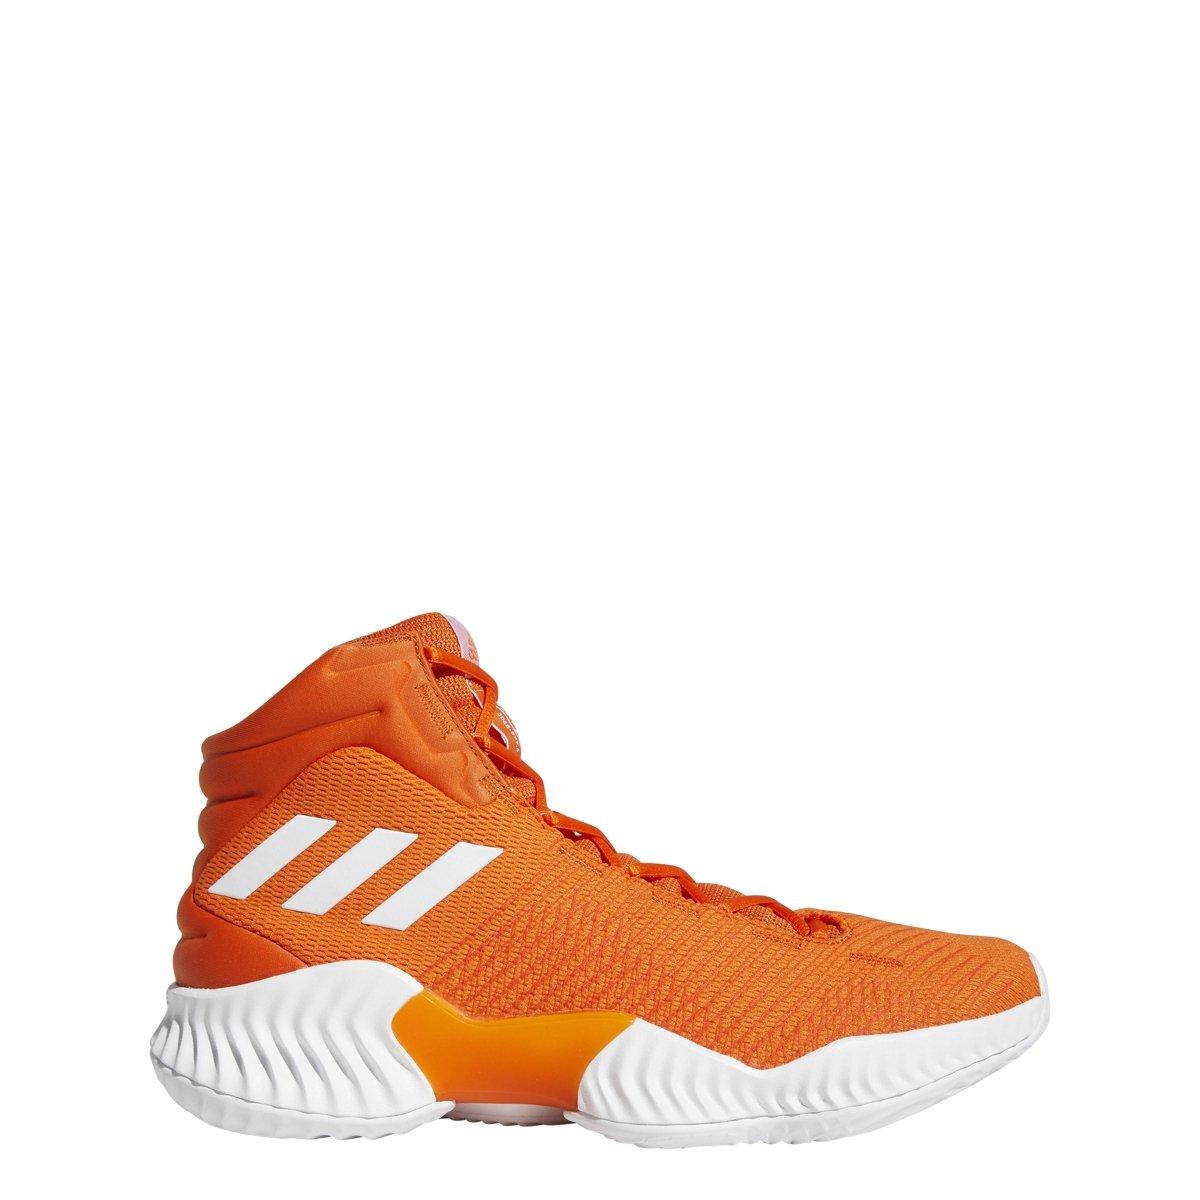 Adidas uomini pro rimbalzare 2018 basket scarpa b077x43vtp d (m) us